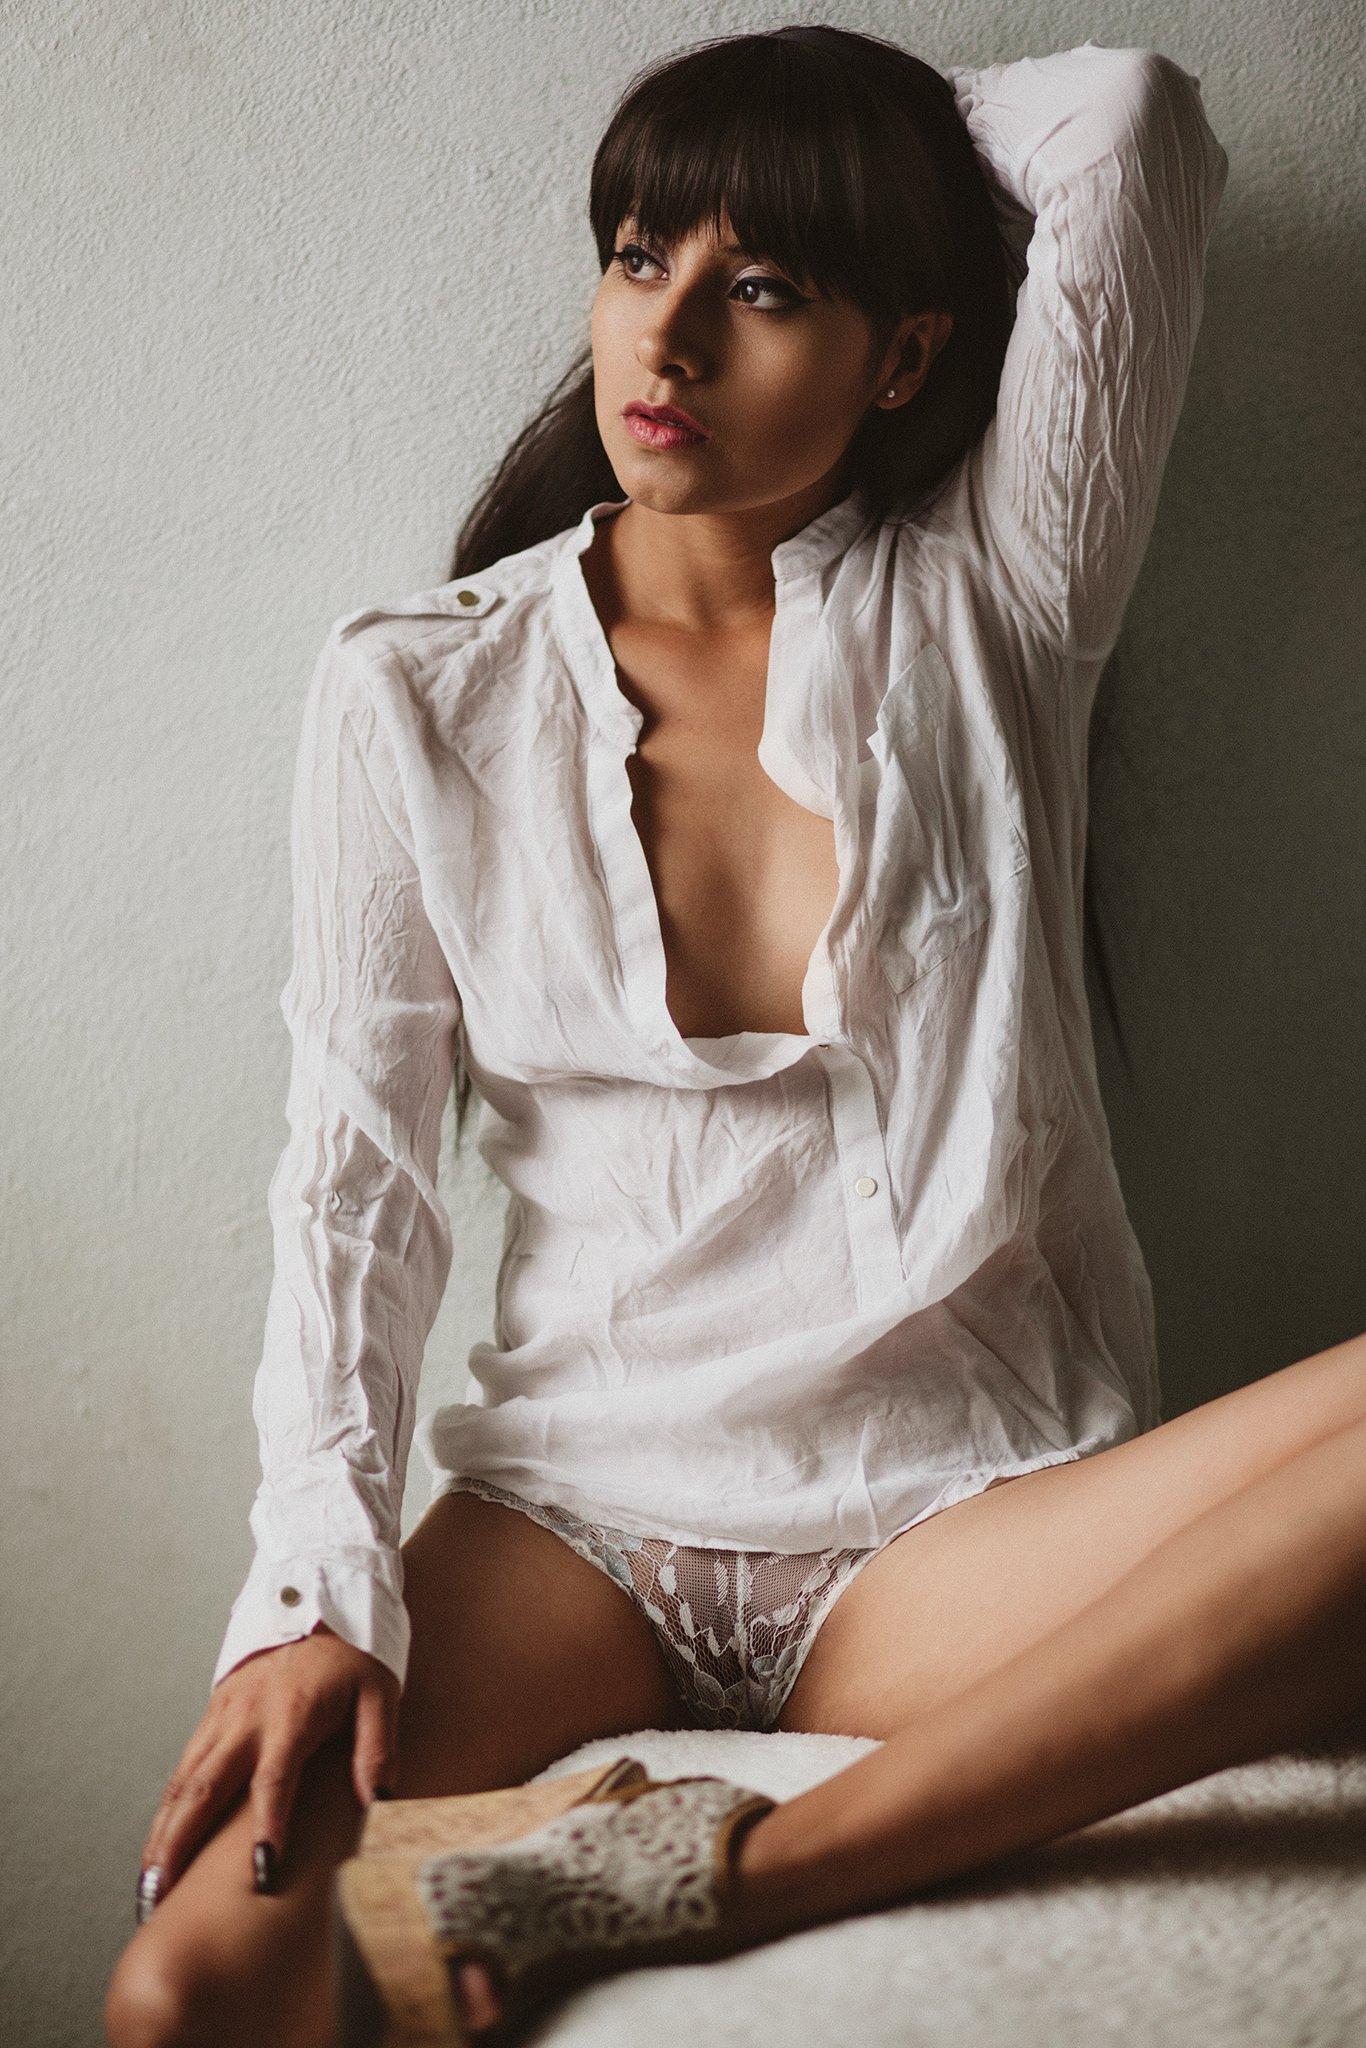 sexy sensual mexican hot girl lingerie body seductive portrait girl woman, Hernandez Memo